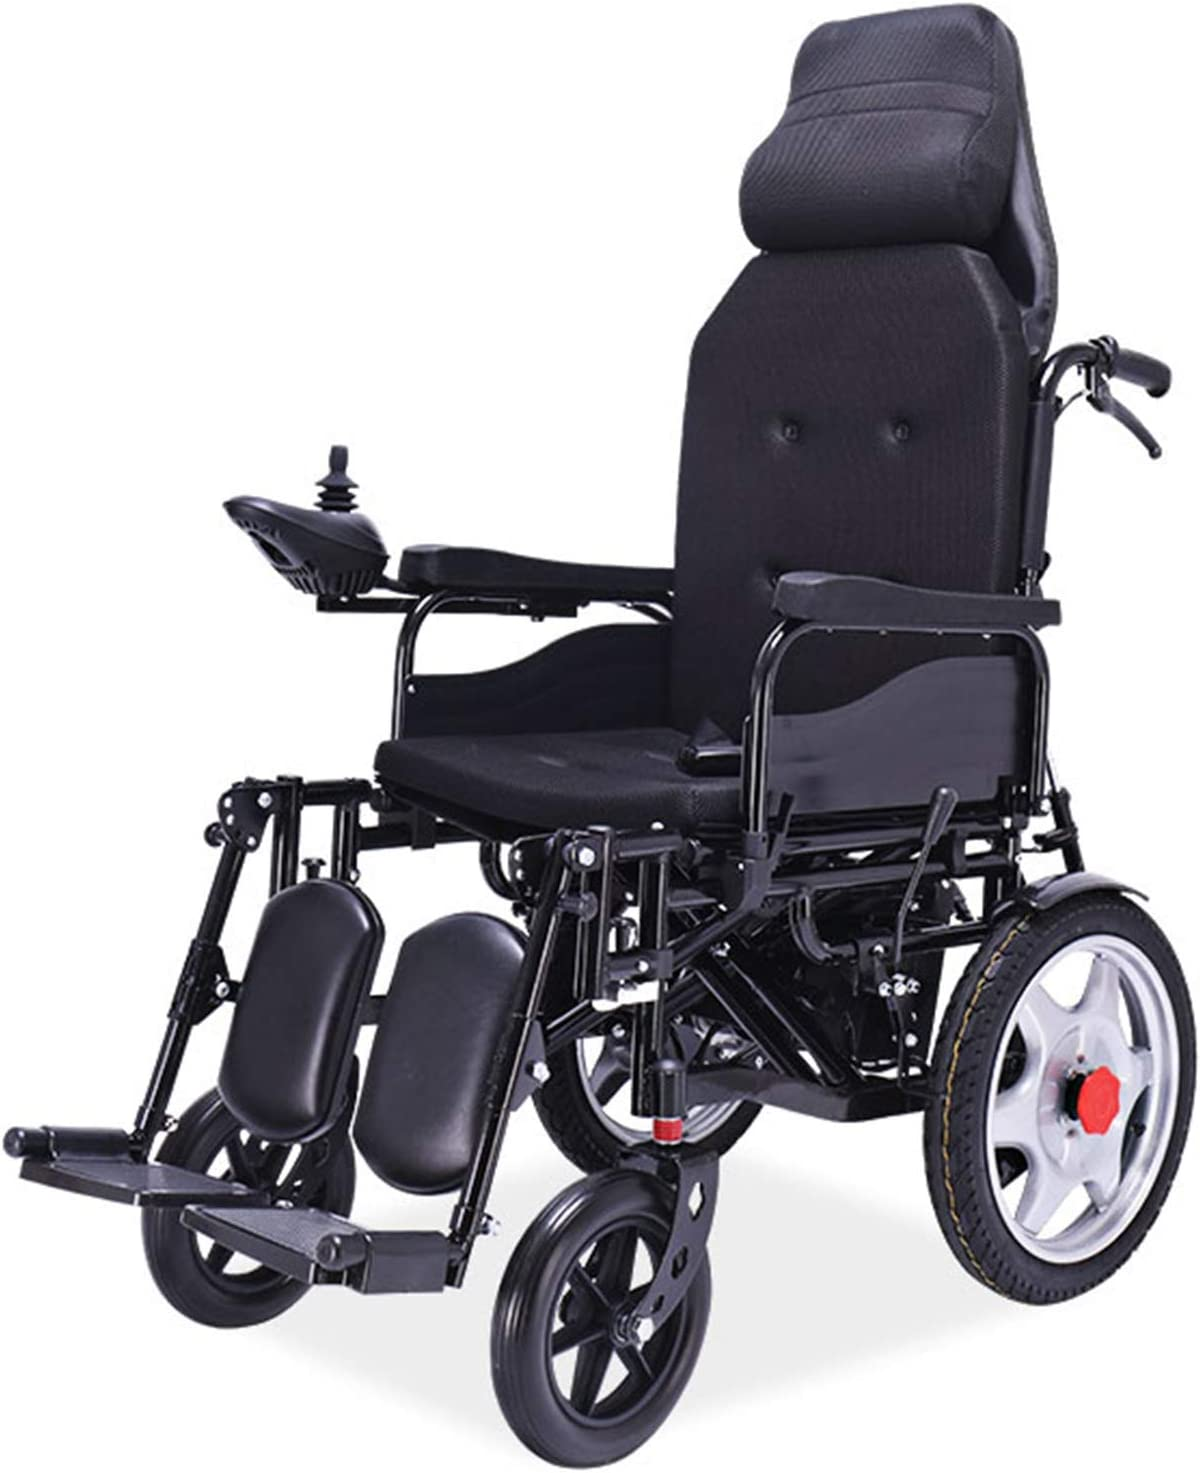 Ligero Power Plegable Wheelchair Bajo Techo, En Exteriores Batería De Litio Silla De Ruedas Minusvalidos,Marco de Aleación de Aluminio Abrir/Plegar En 1 Segundo ALGFree